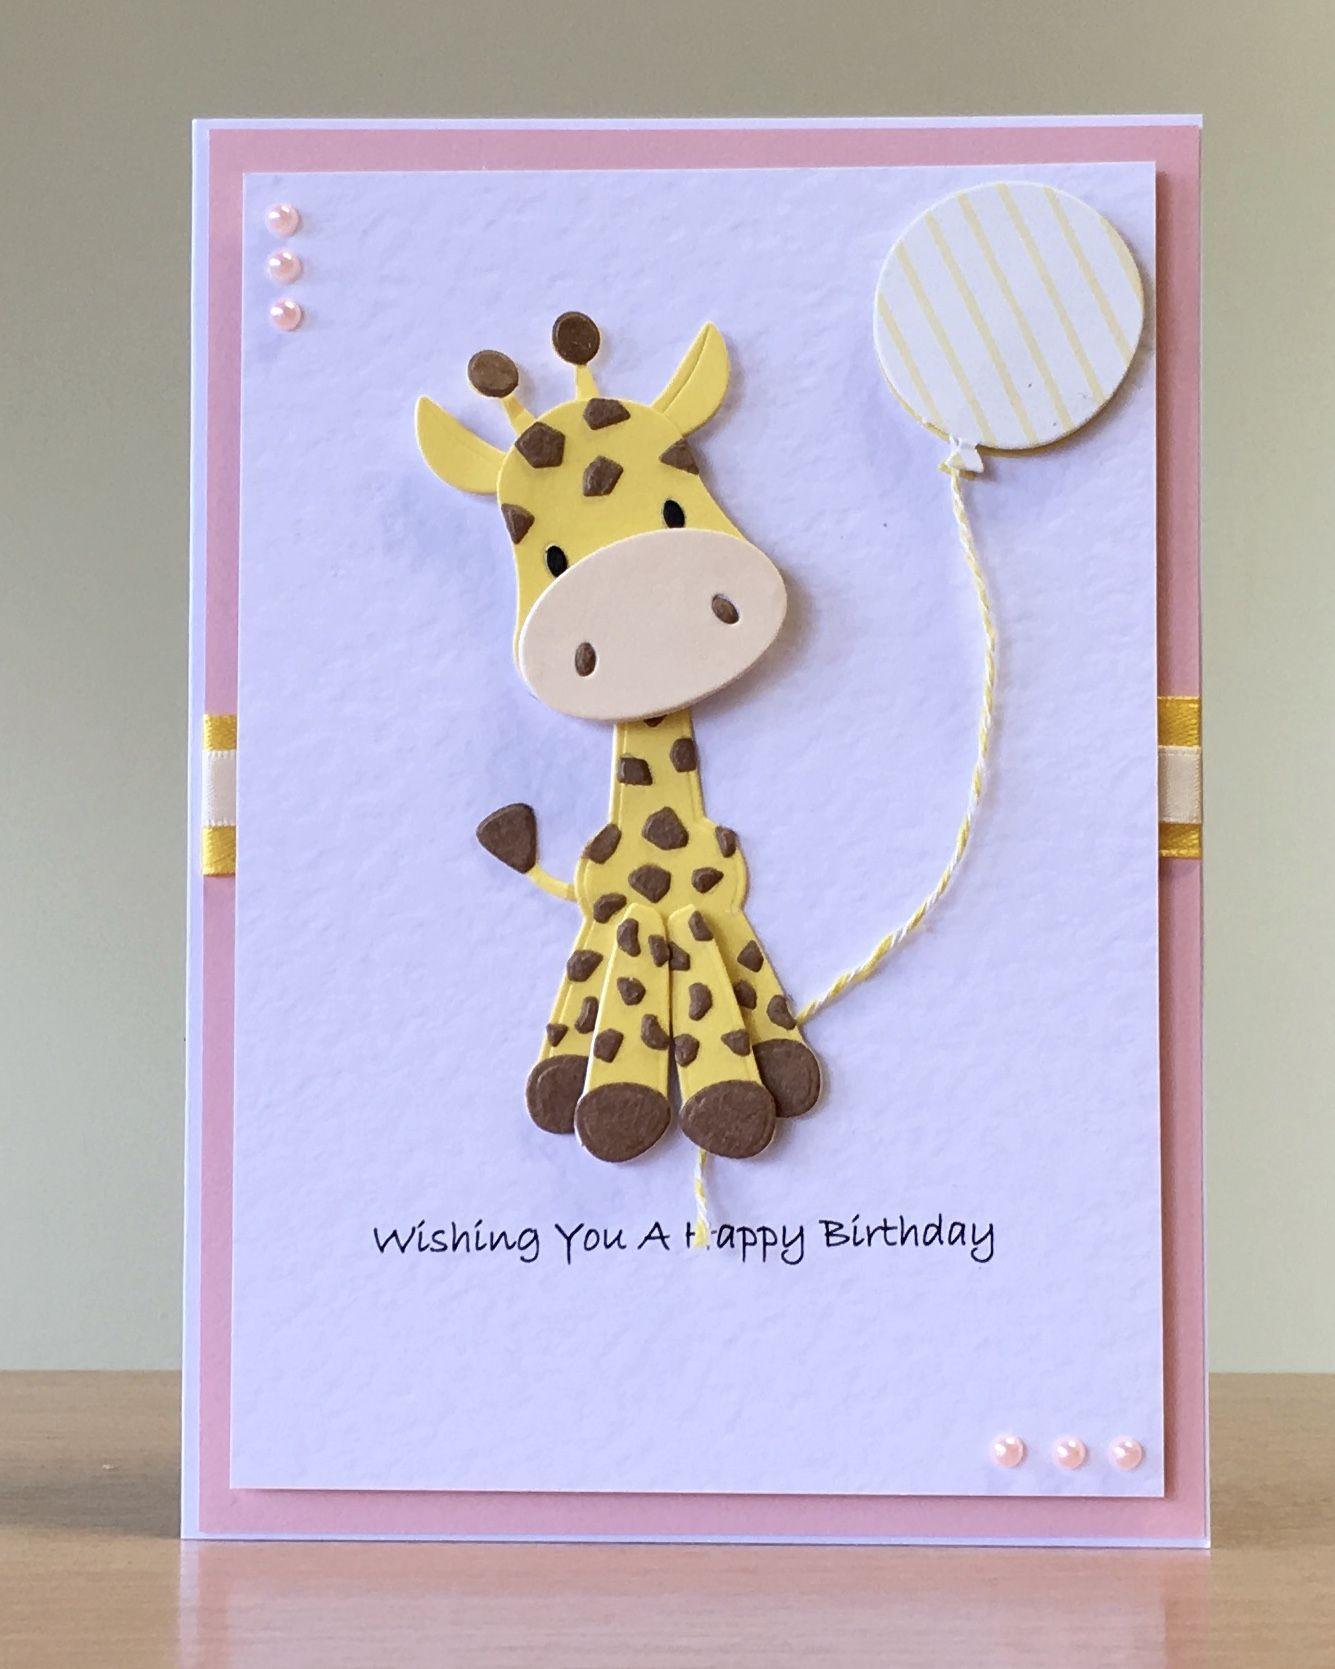 Handmade Giraffe Birthday Card Handmade Birthday Cards Birthday Card Craft Kids Birthday Cards